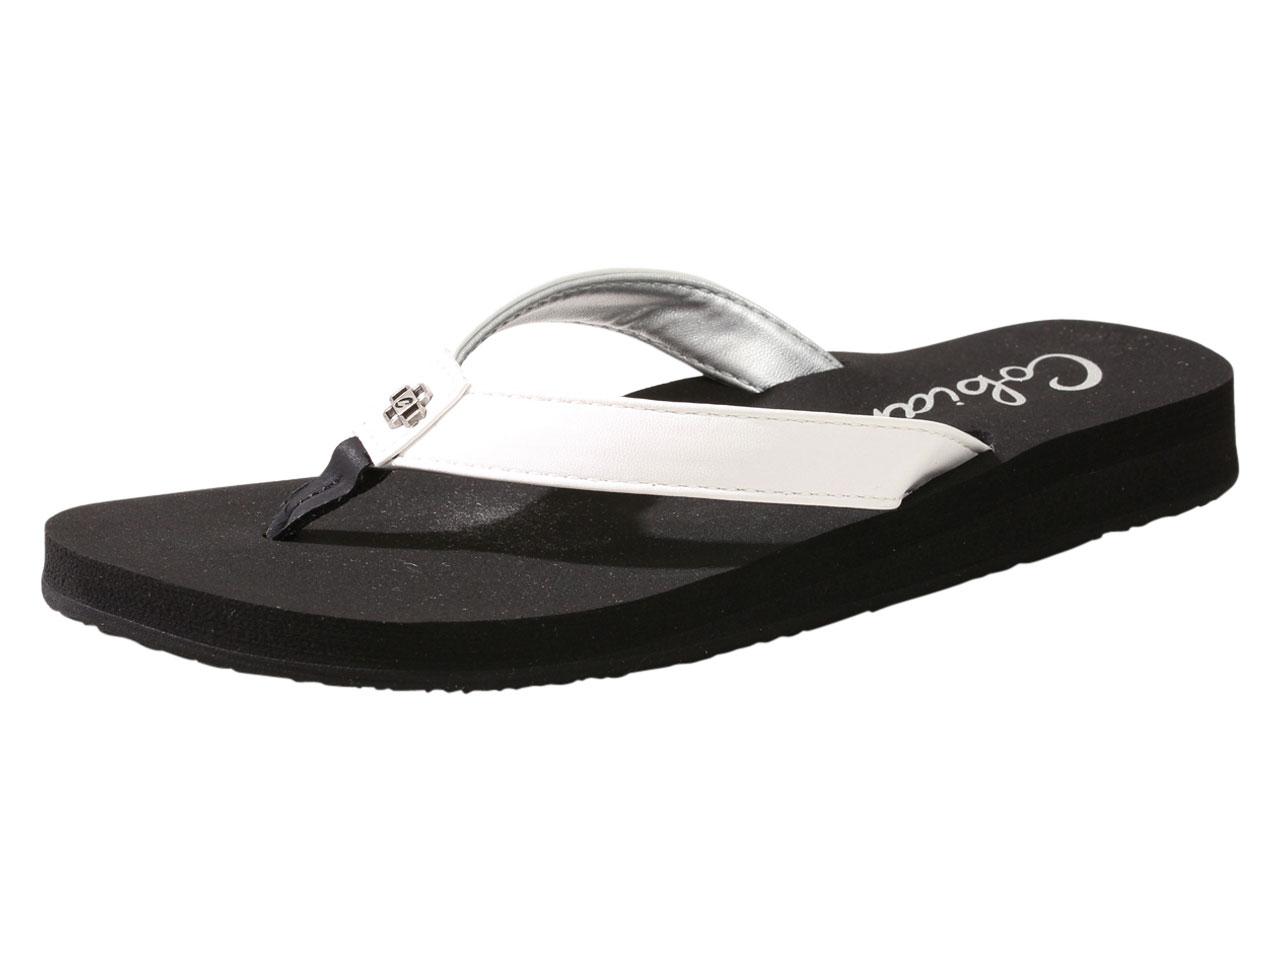 308dc5401 Cobian womens skinny bounce flip flops sandals shoes ebay jpg 1280x960  Cobian flip flops